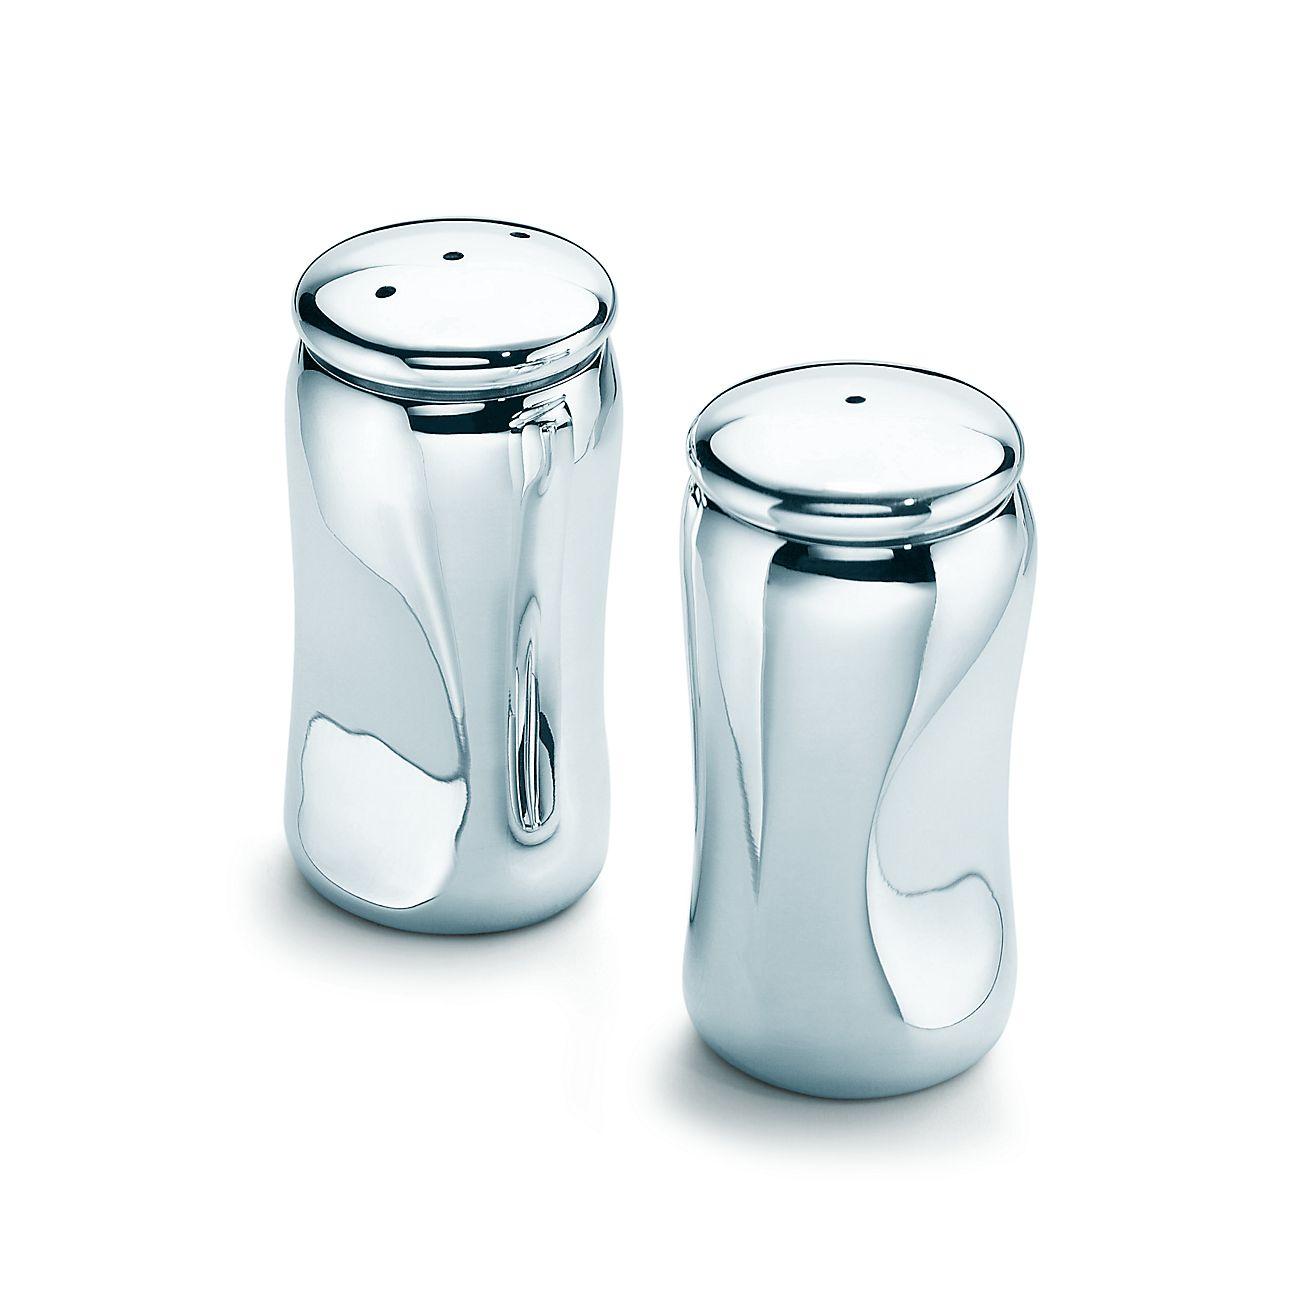 elsa peretti® thumbprint salt and pepper shakers silver  - elsa peretti®thumbprint salt and pepper shakers